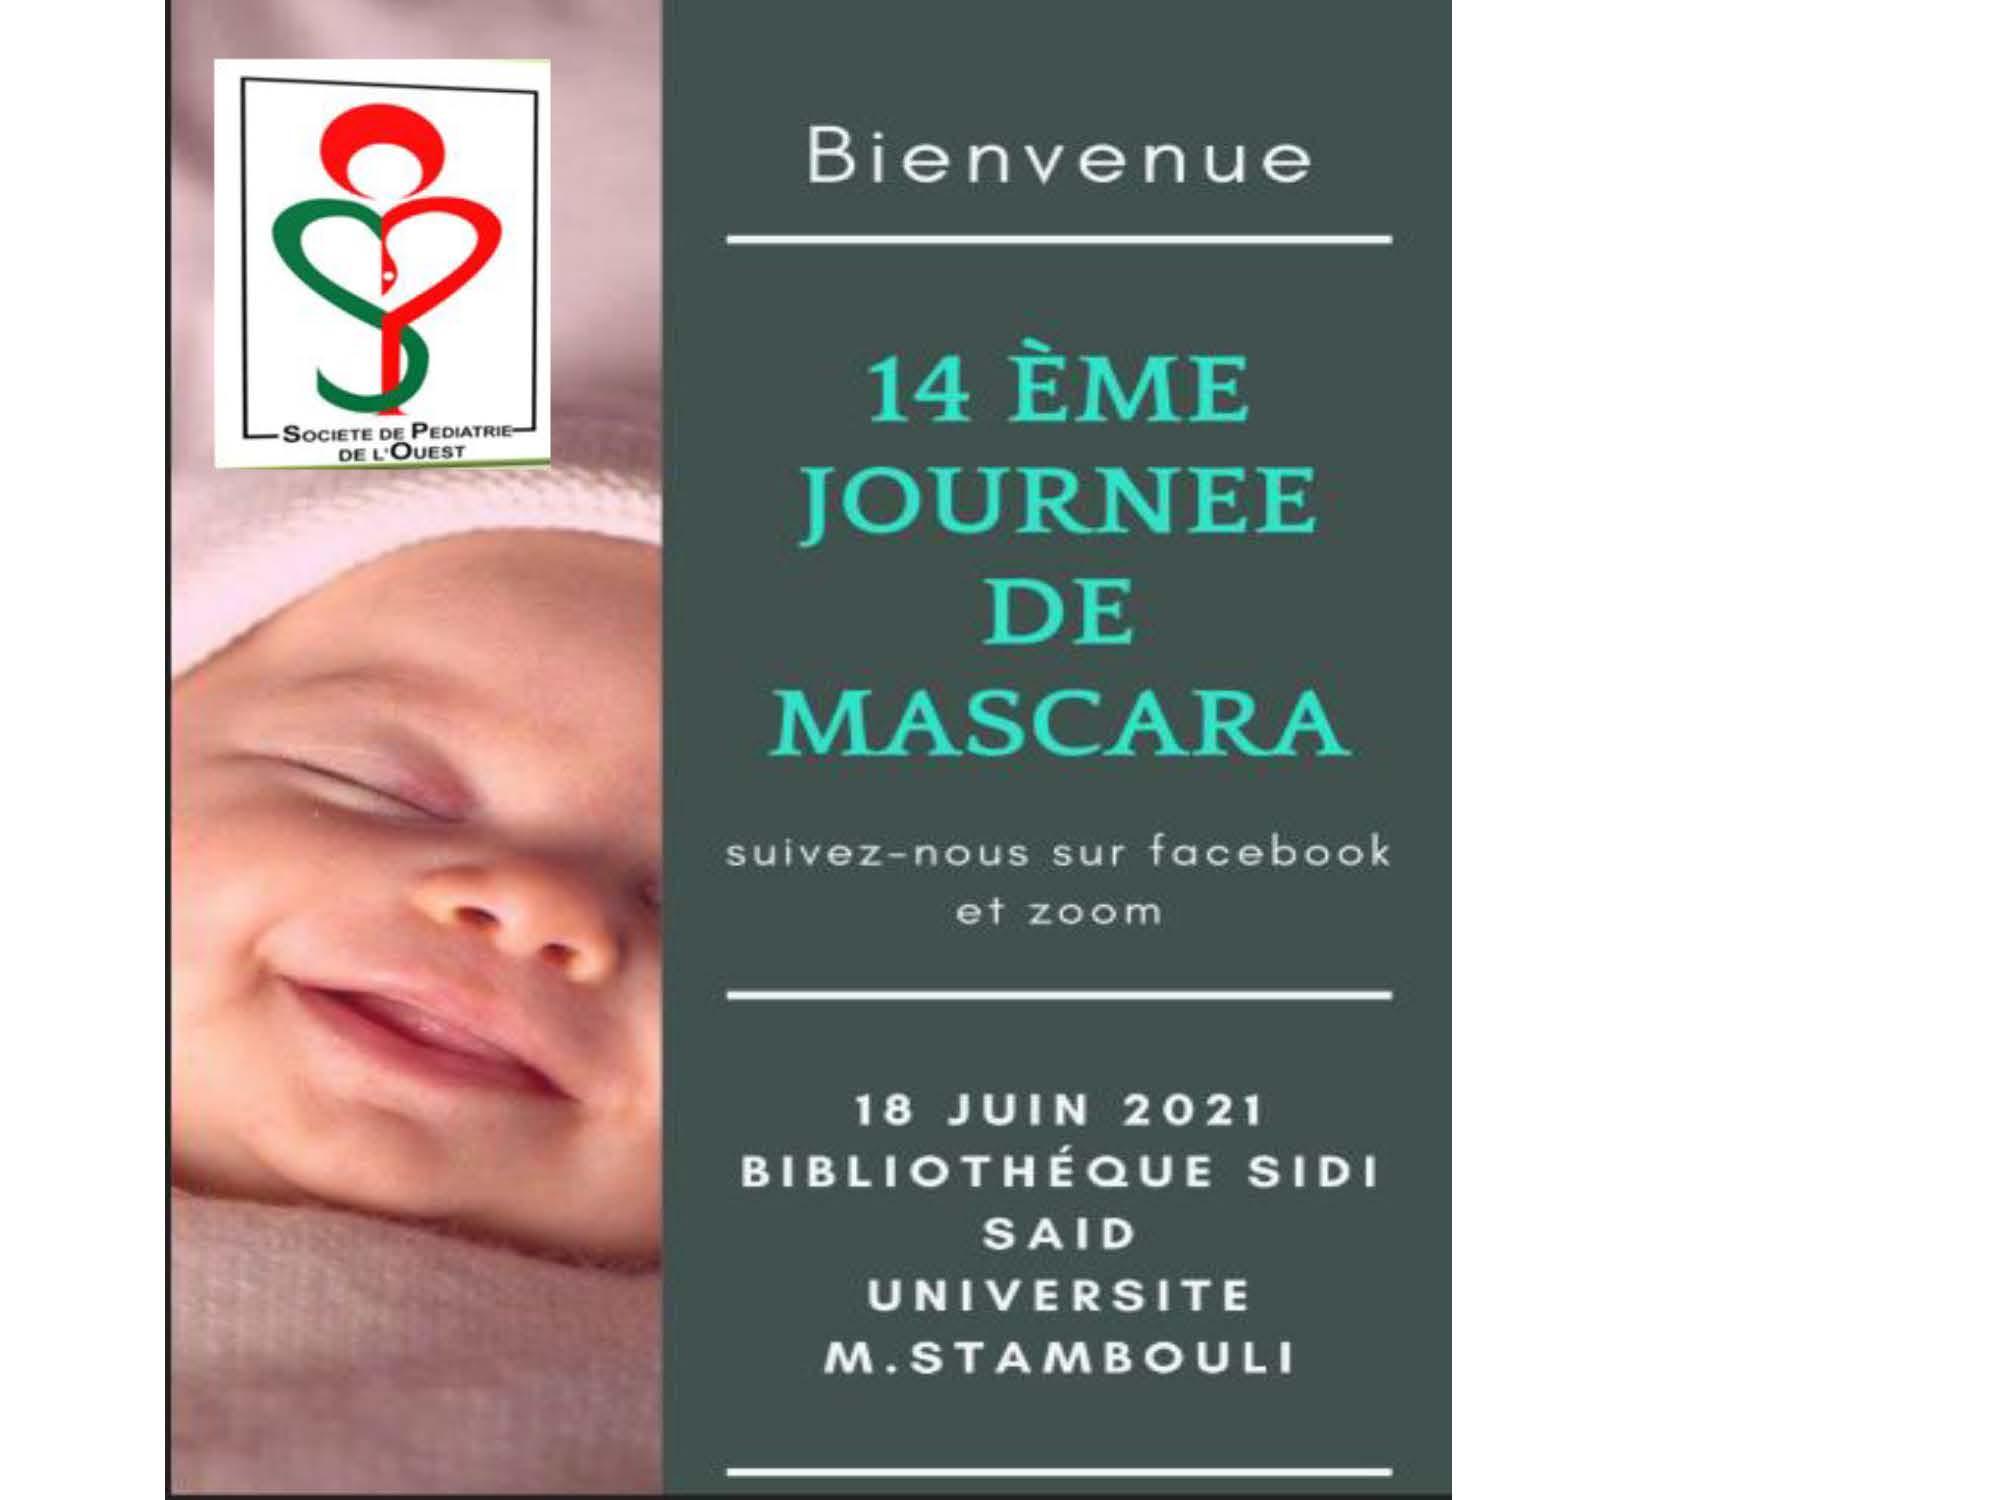 affiche mascara2021